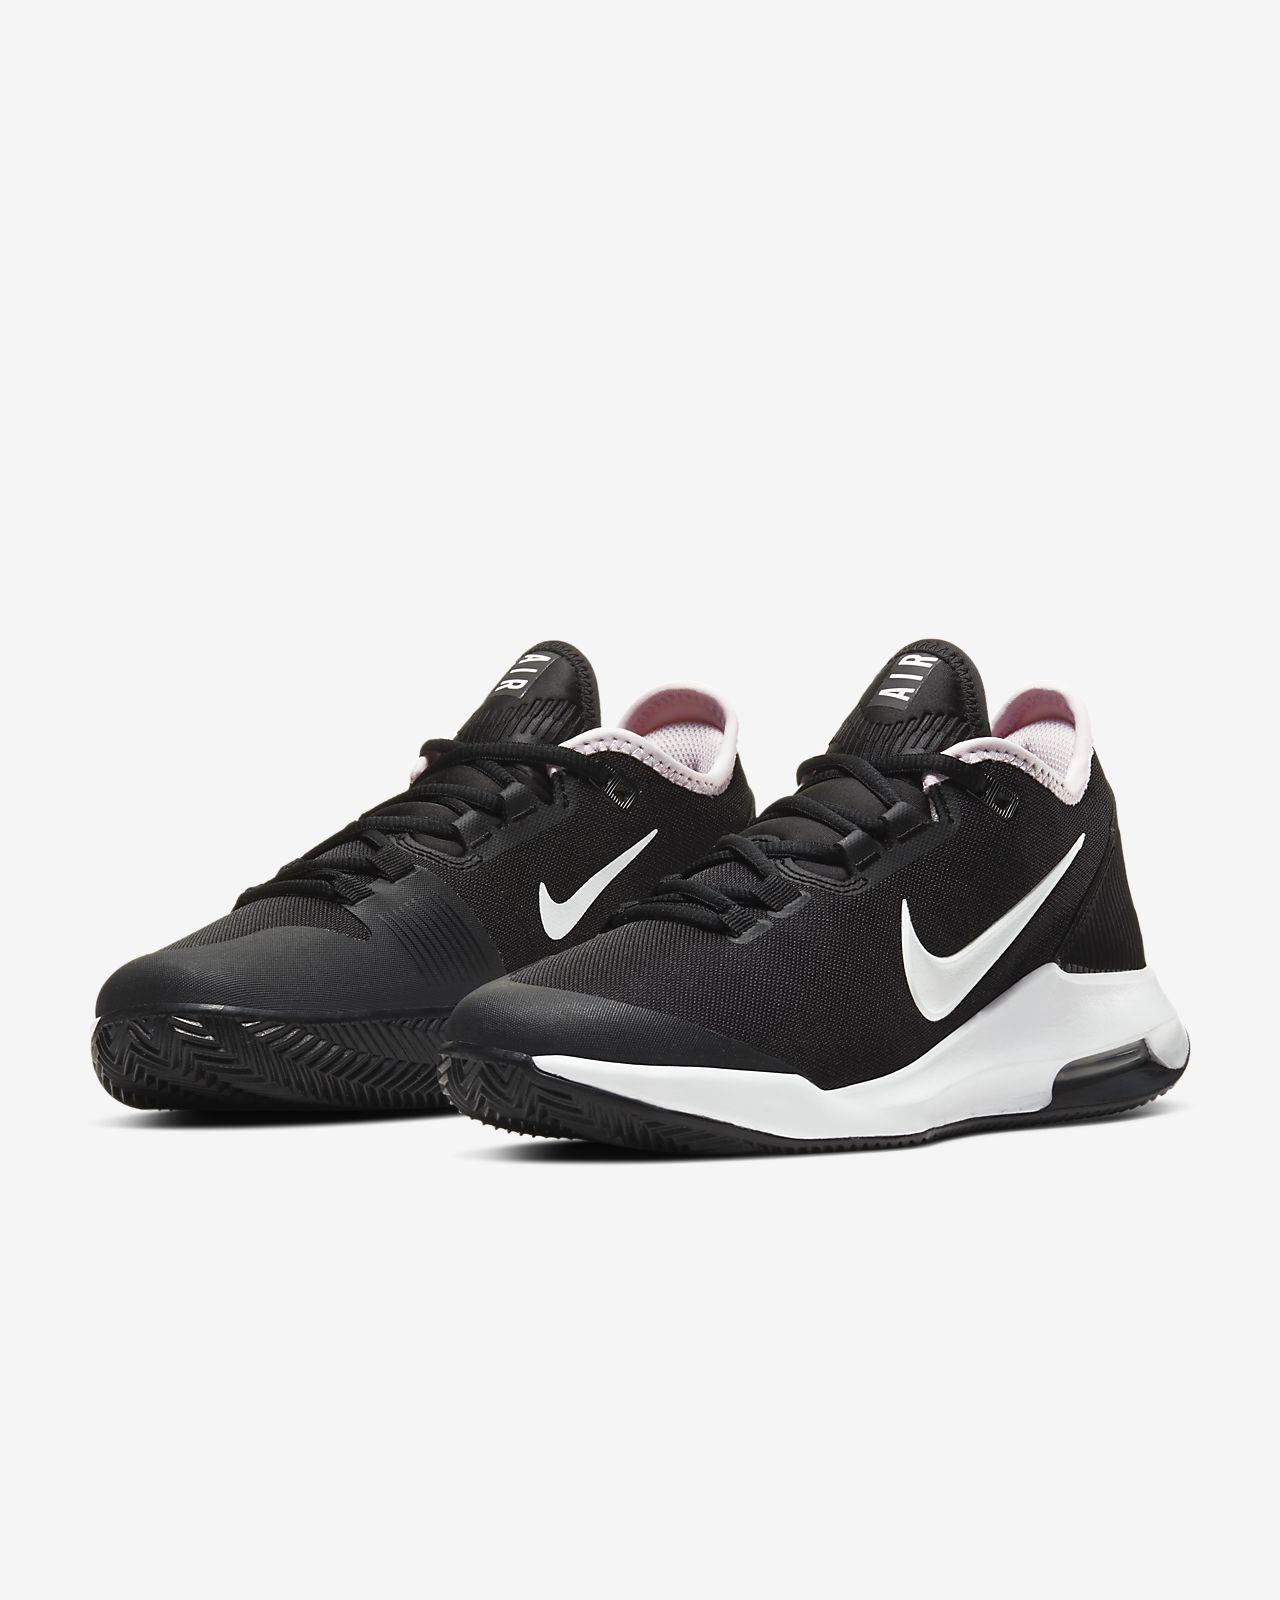 Sapatilhas de ténis para terra batida NikeCourt Air Max Wildcard para mulher